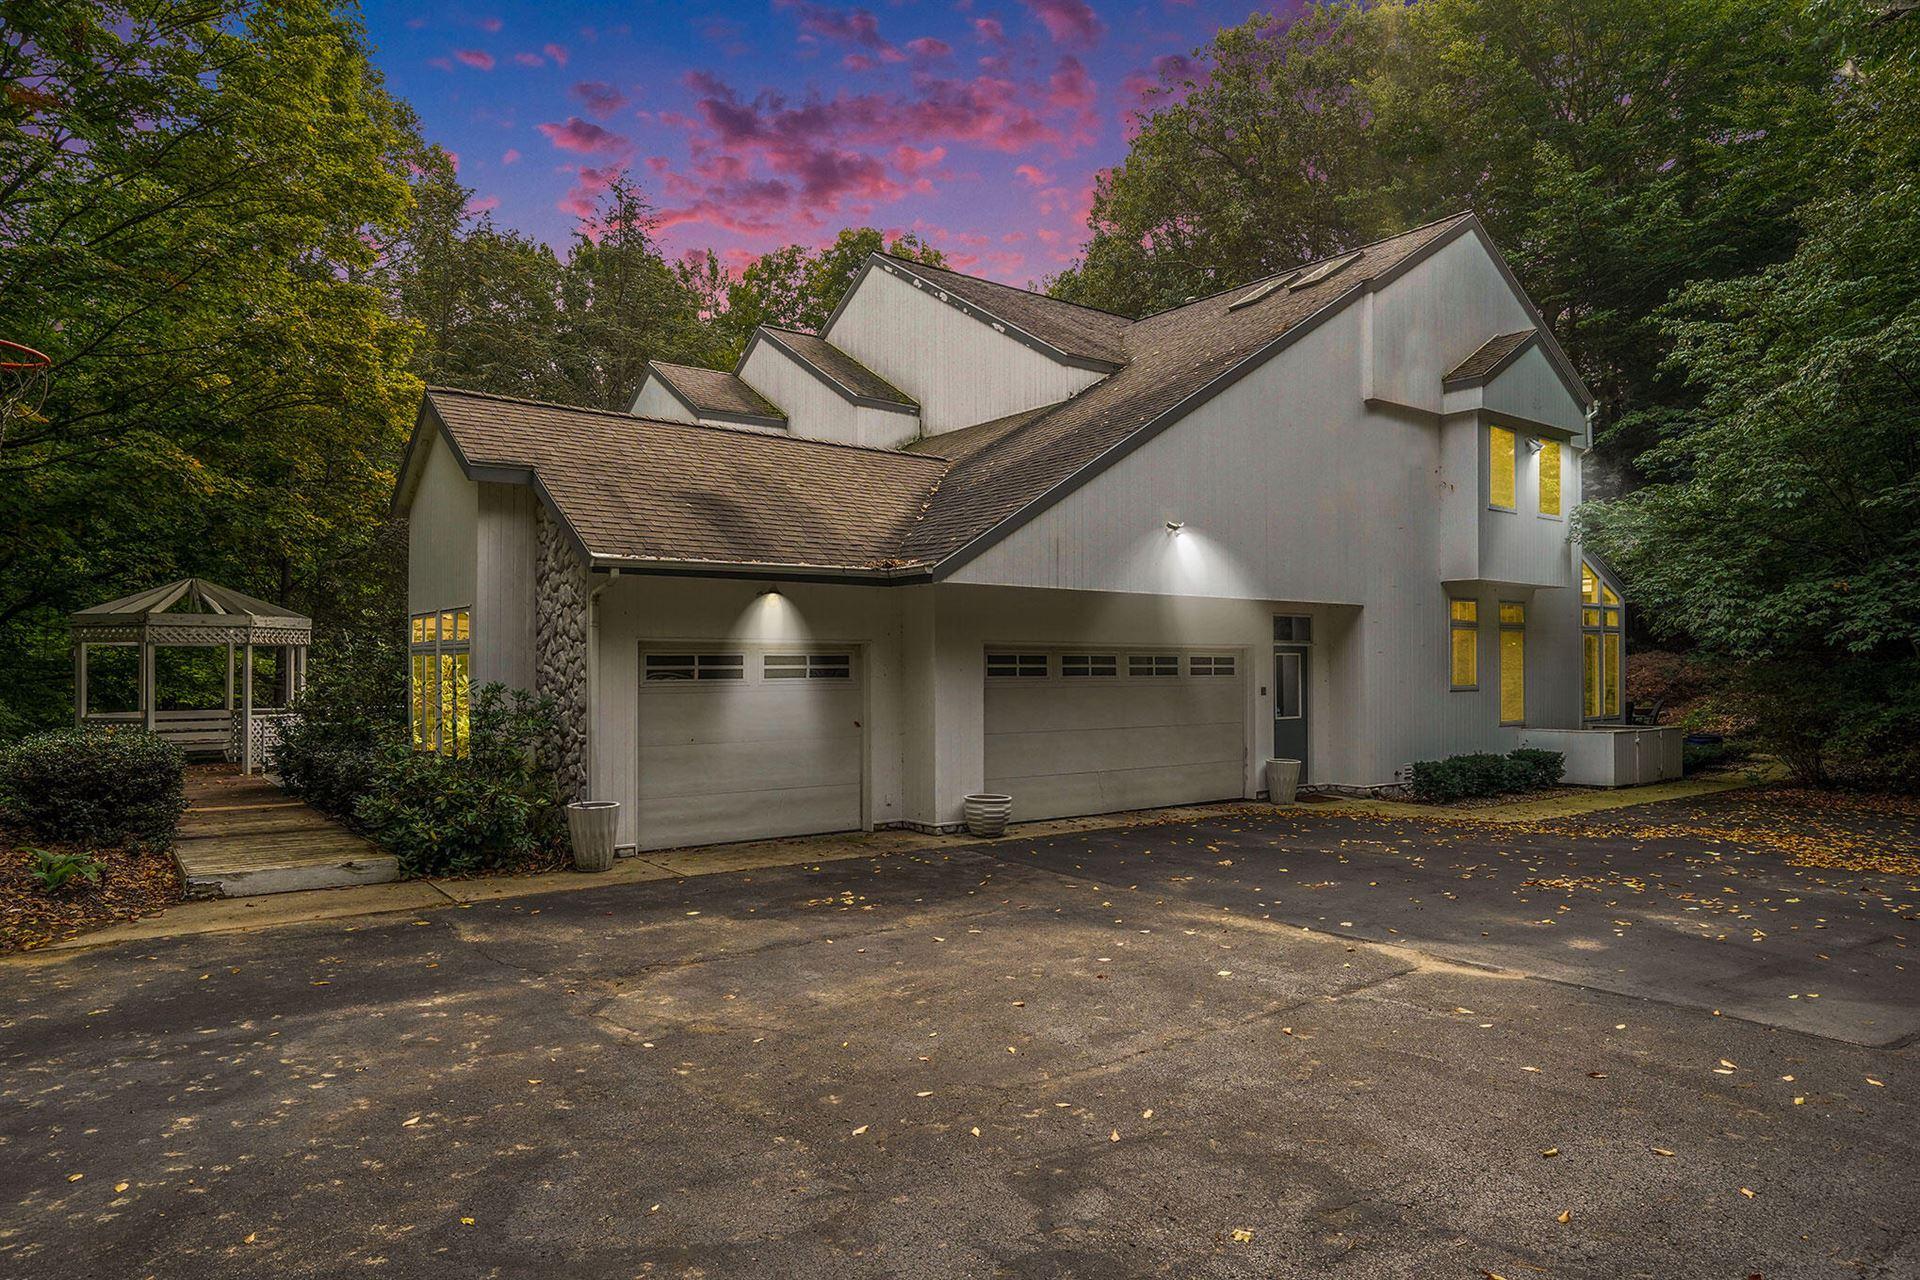 Photo of 13295 Redbird Lane, Grand Haven, MI 49417 (MLS # 21110731)